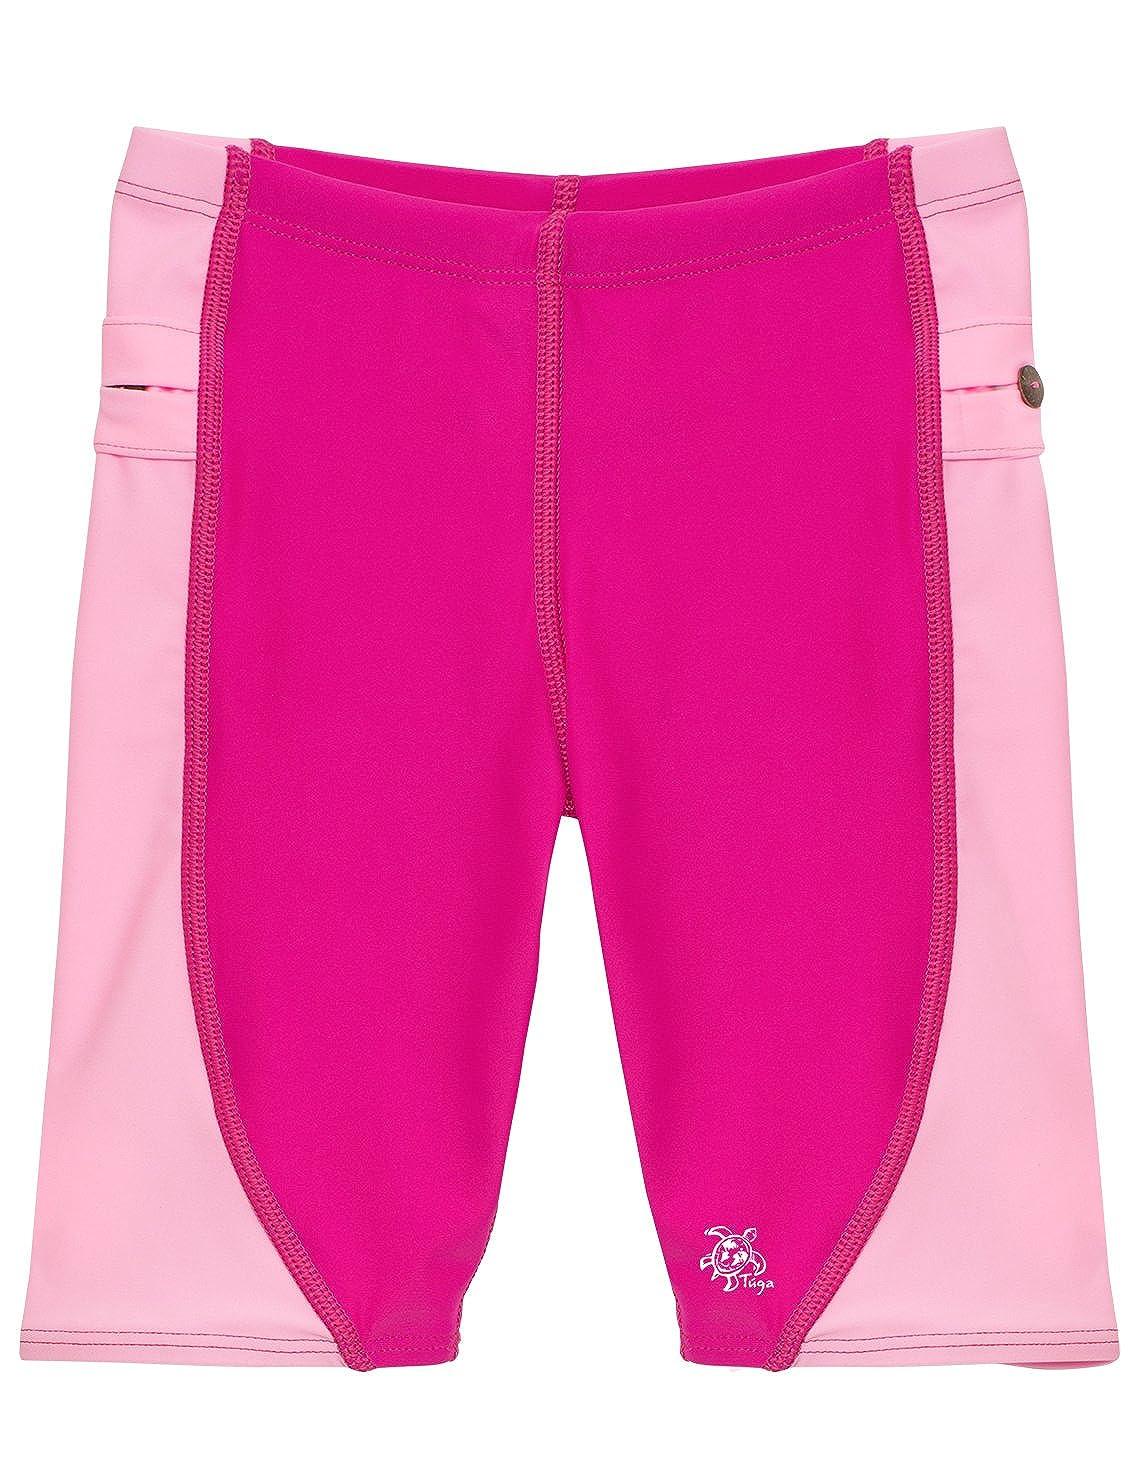 Tuga Girl's Snorkeling Jammer, UPF 50+ Sun Protection Swim Short